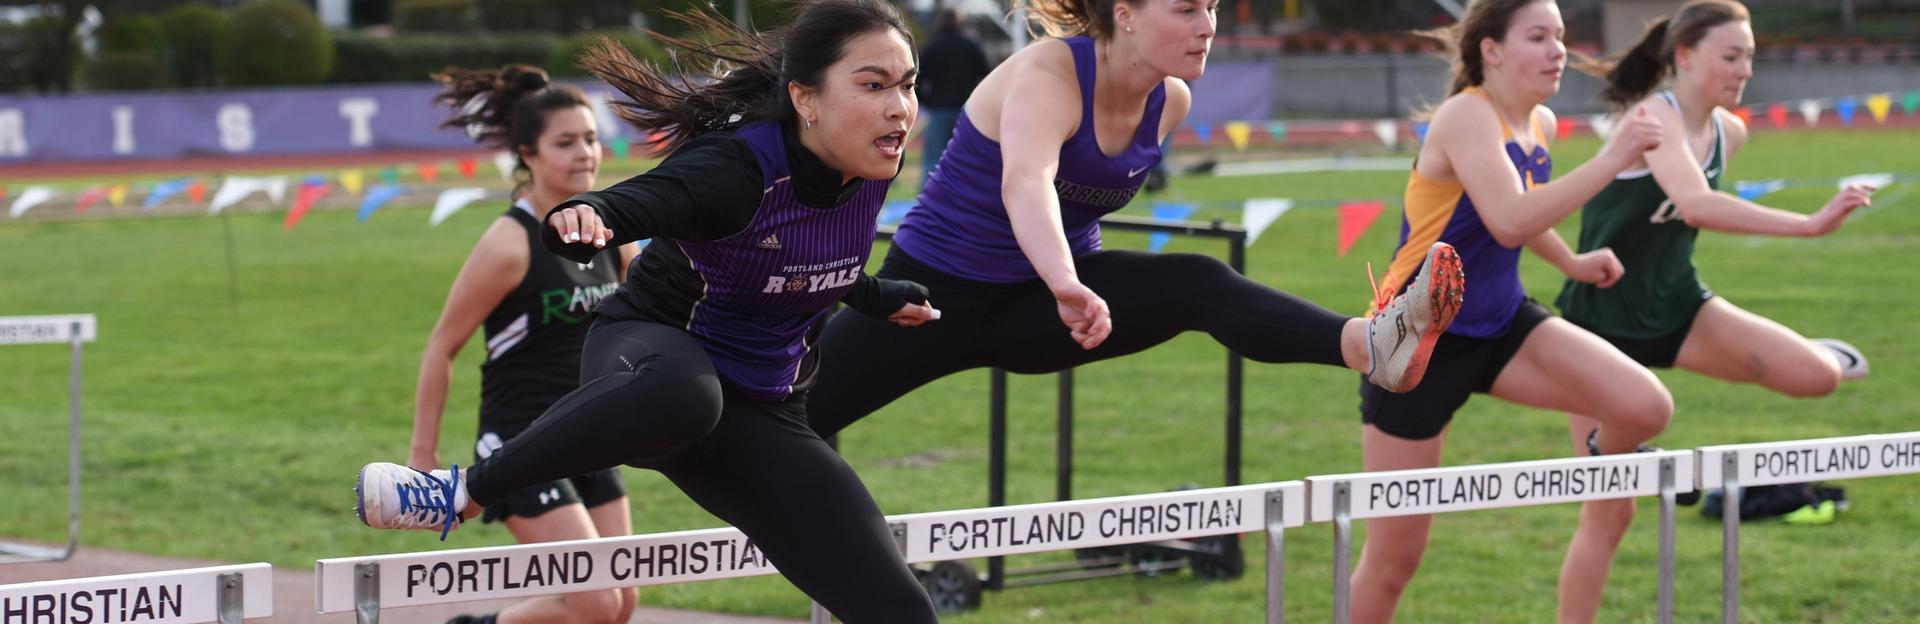 Track - hurdles athlete